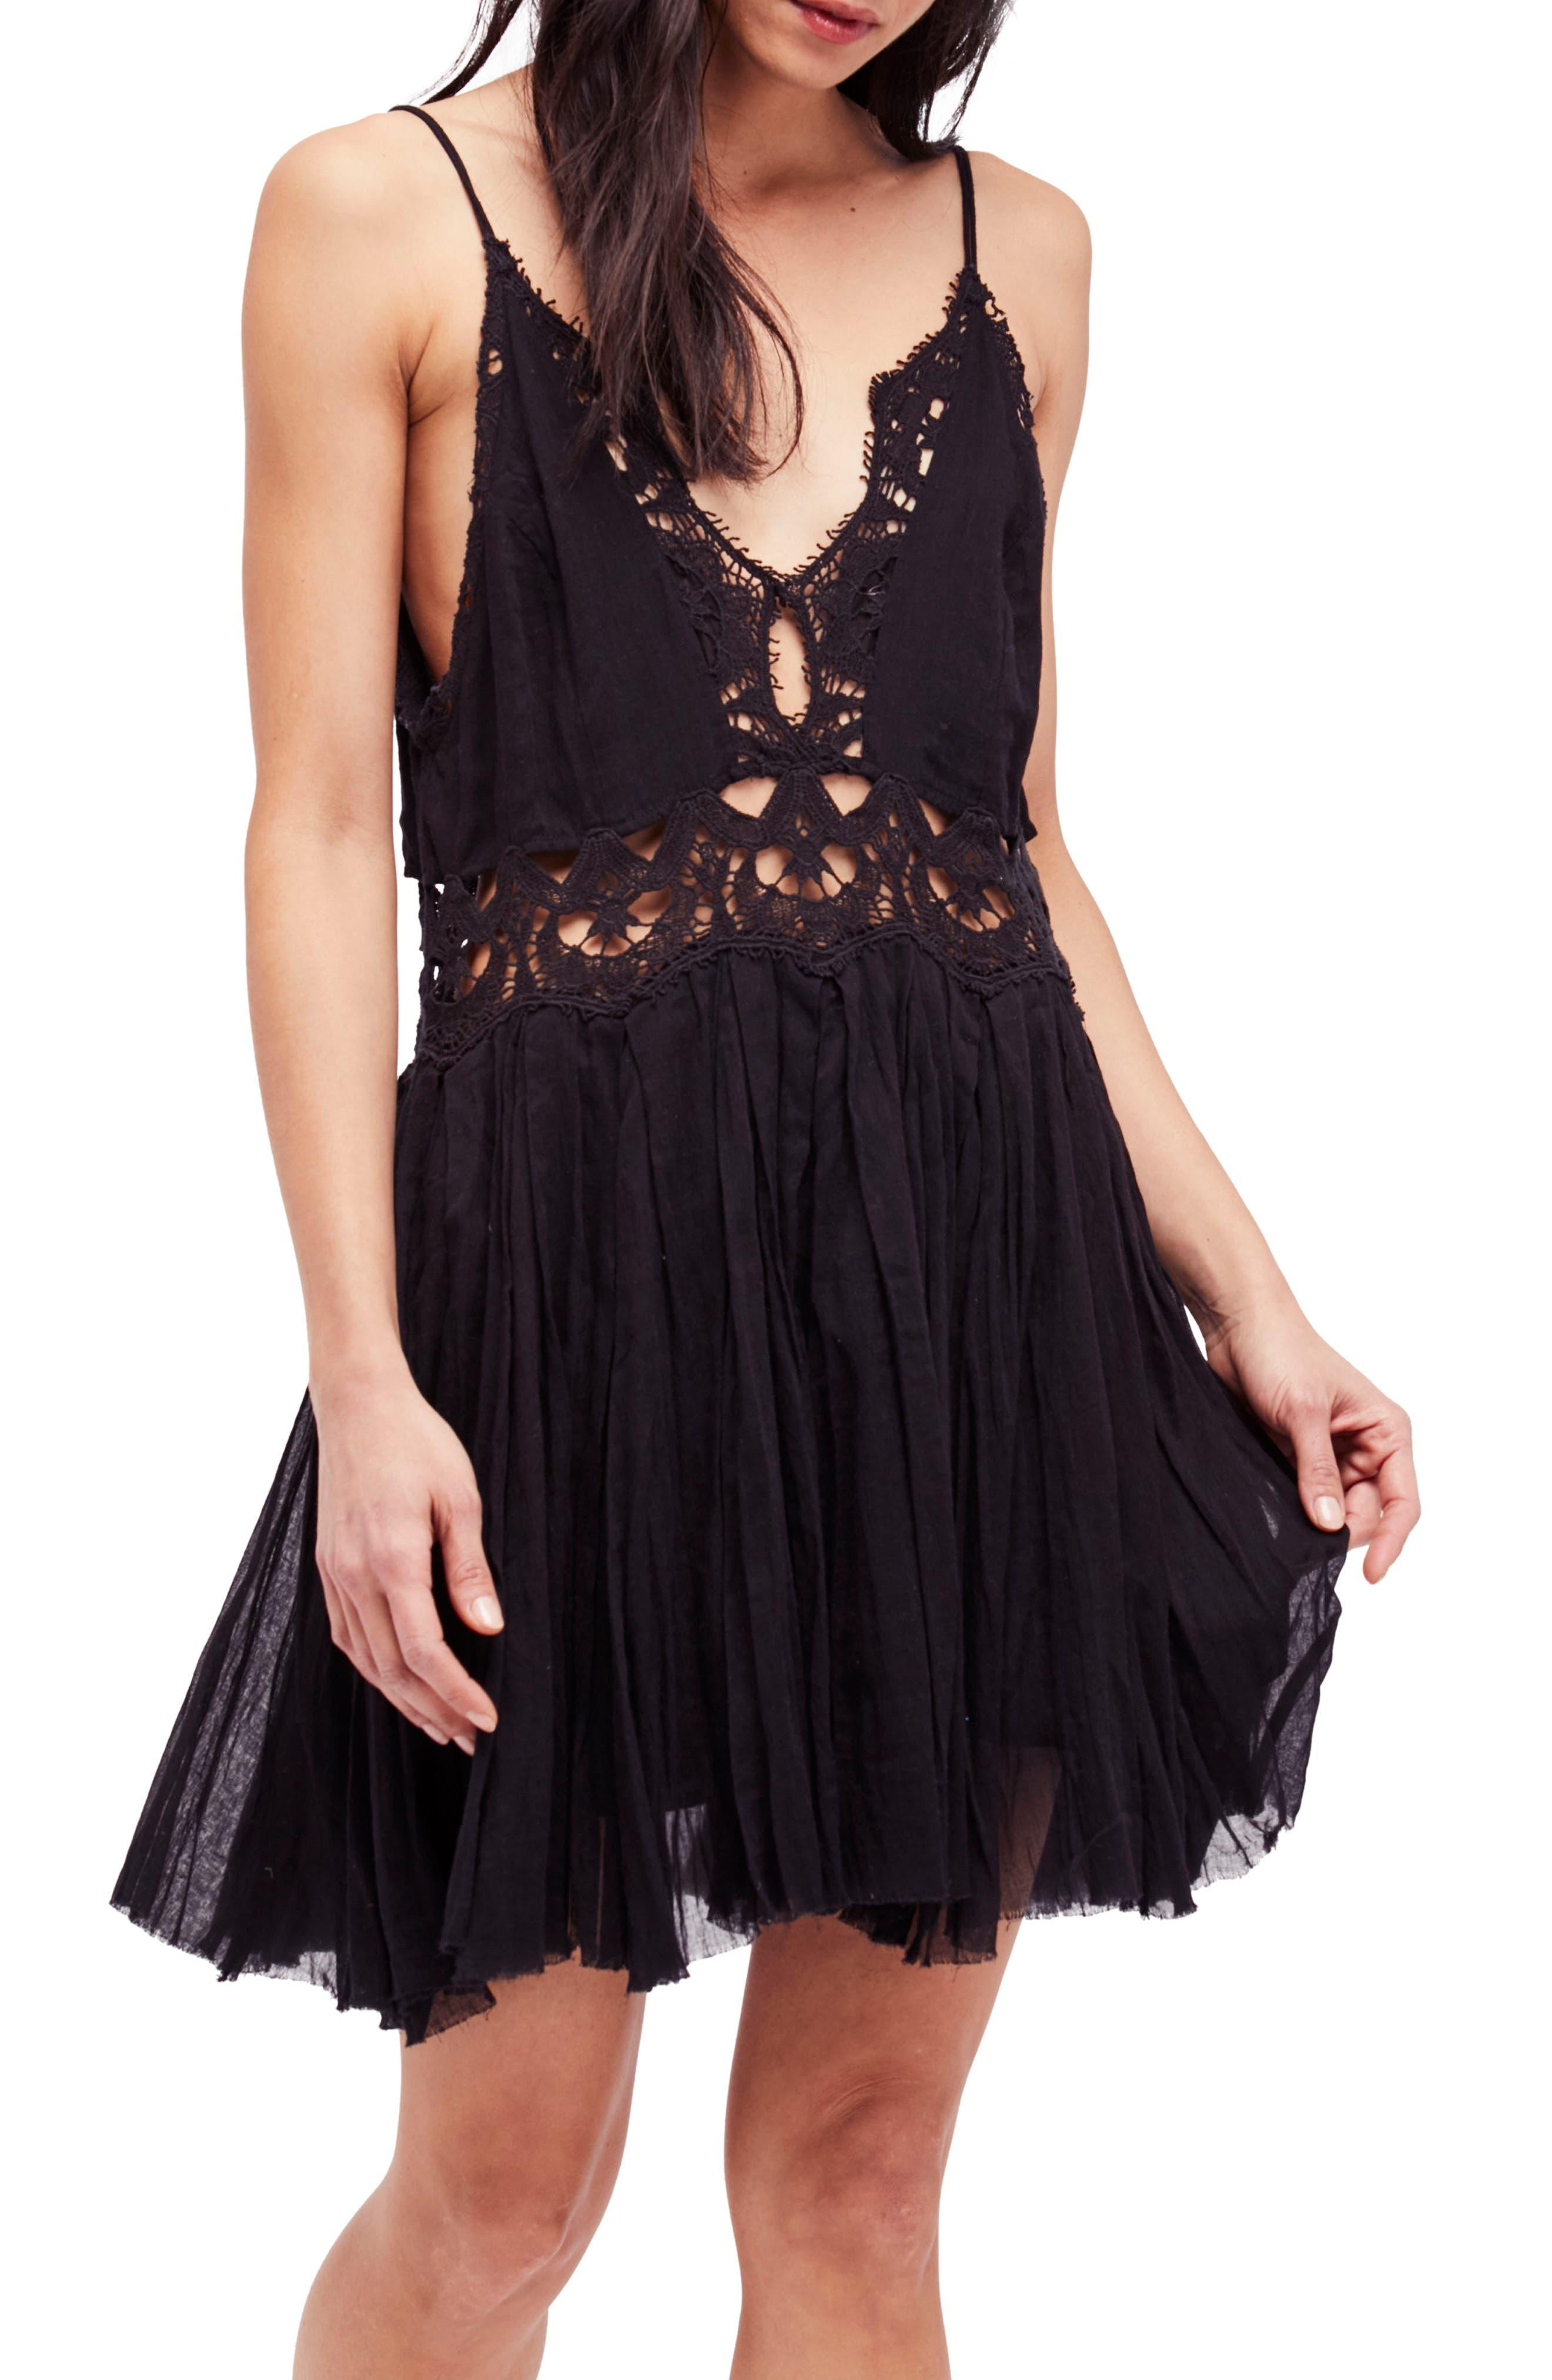 Alternate Image 1 Selected - Free People Ilektra Lace Minidress